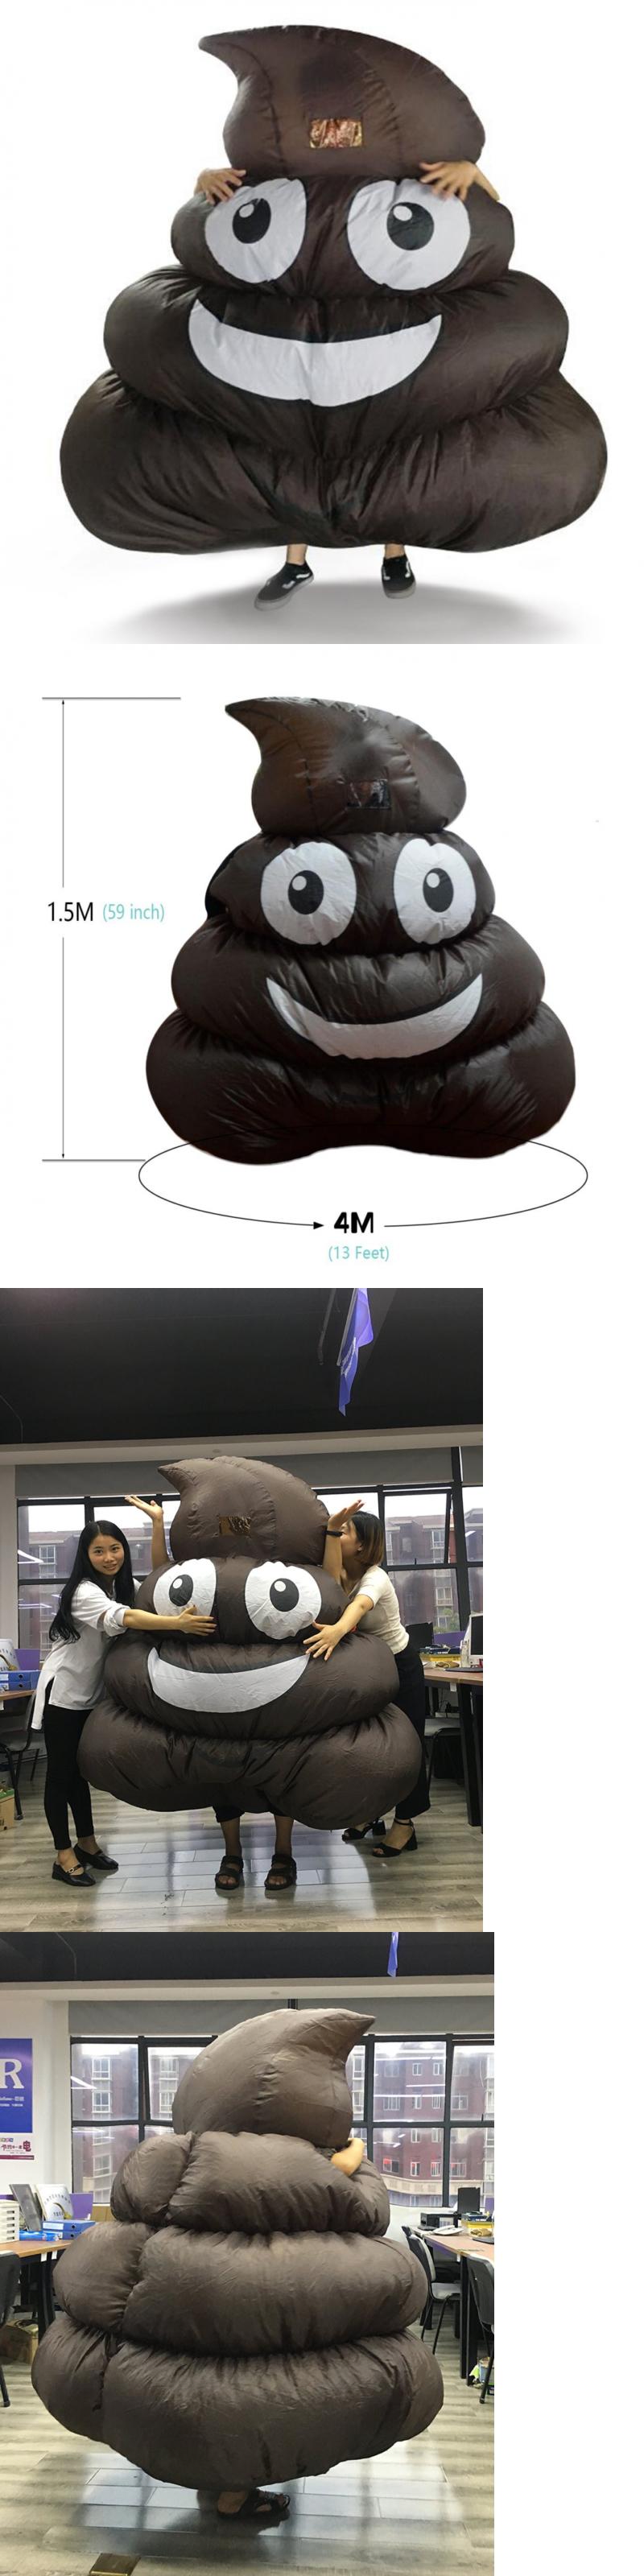 other backyard games 159081 dreamowl inflatable giant emoji